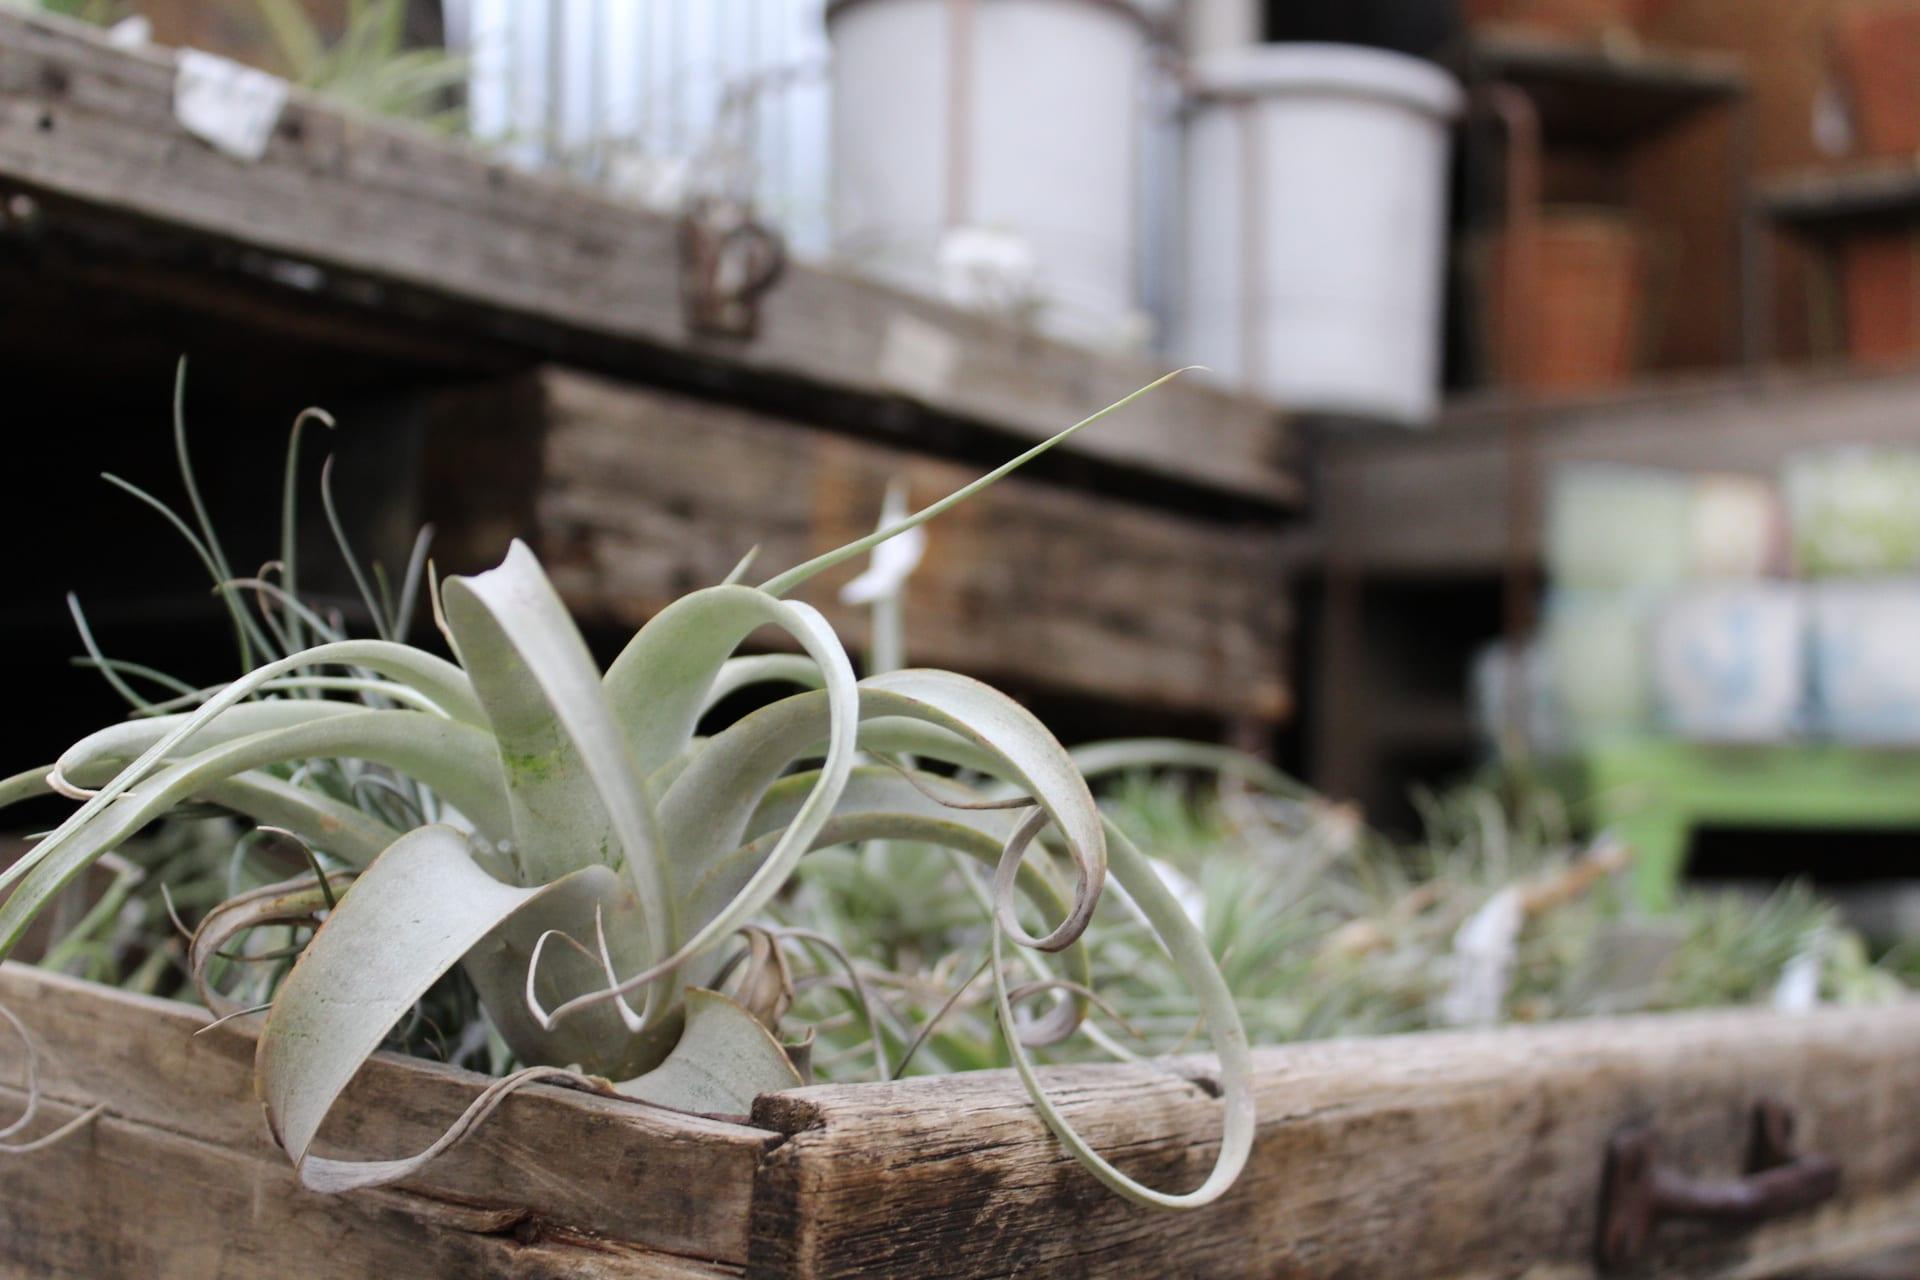 tillandsia at city floral greenhouse and garden center